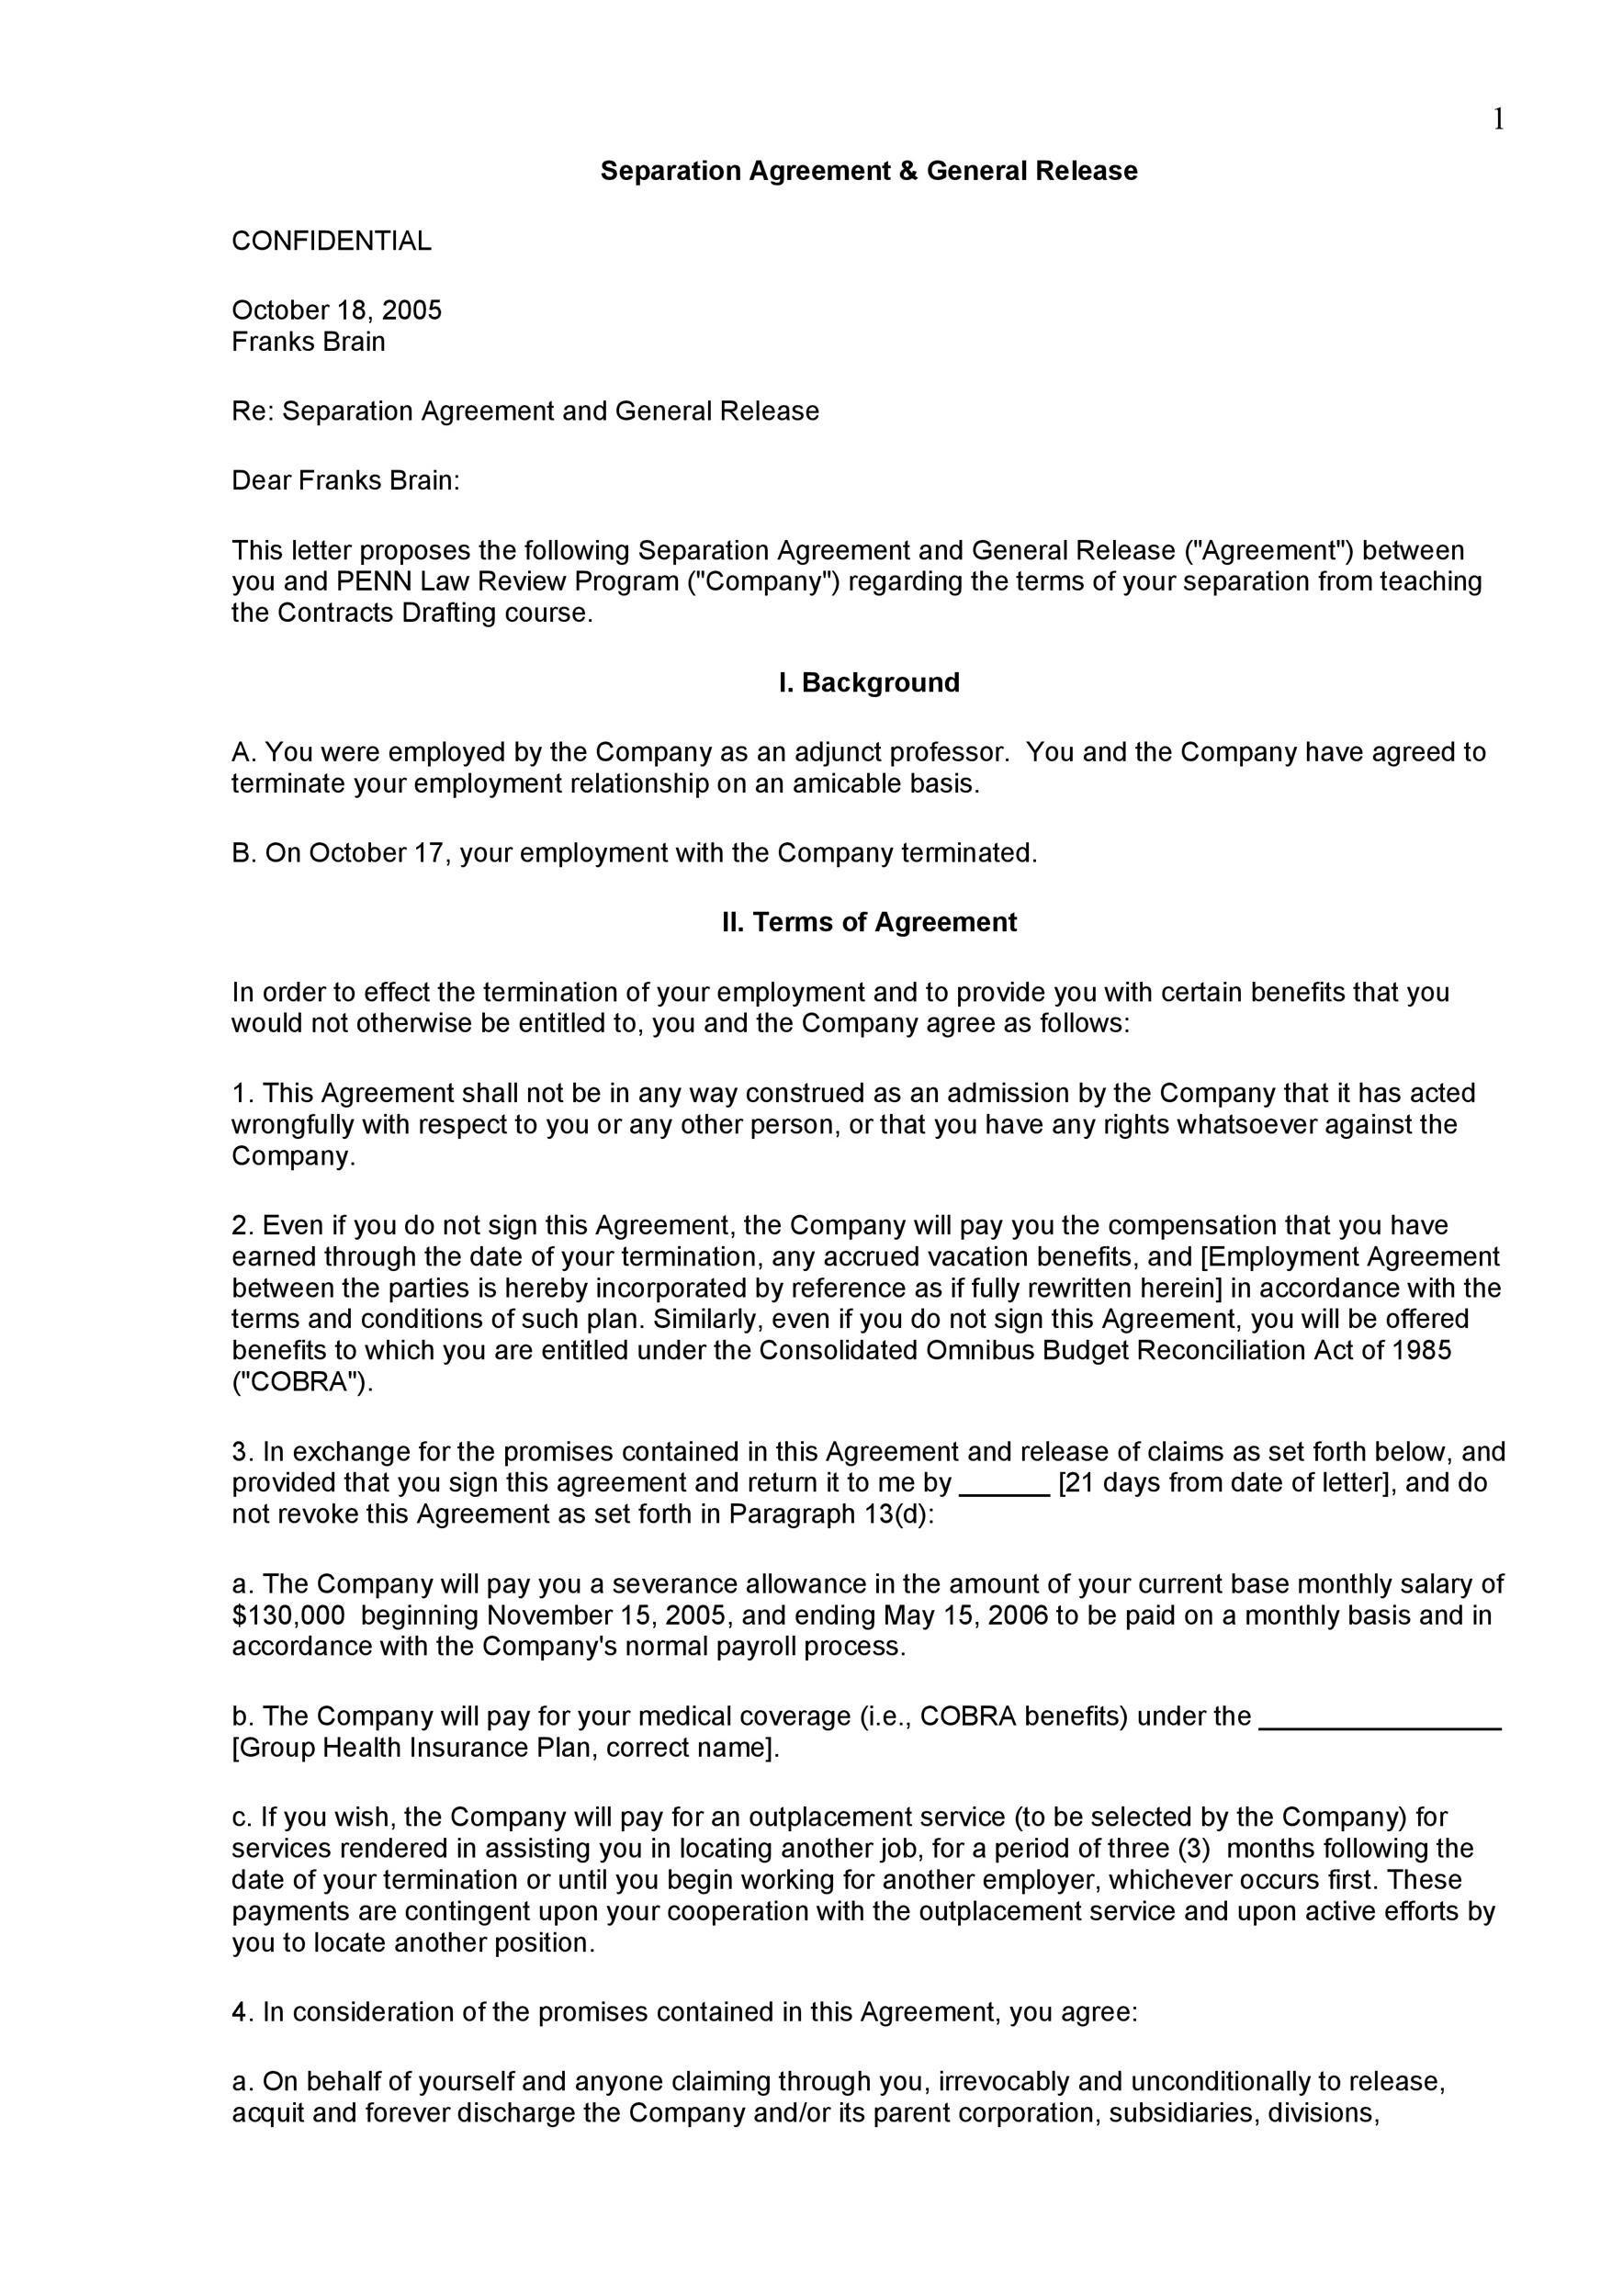 007 Formidable Employment Separation Agreement Template Highest Clarity  Nc Shrm Employee FloridaFull